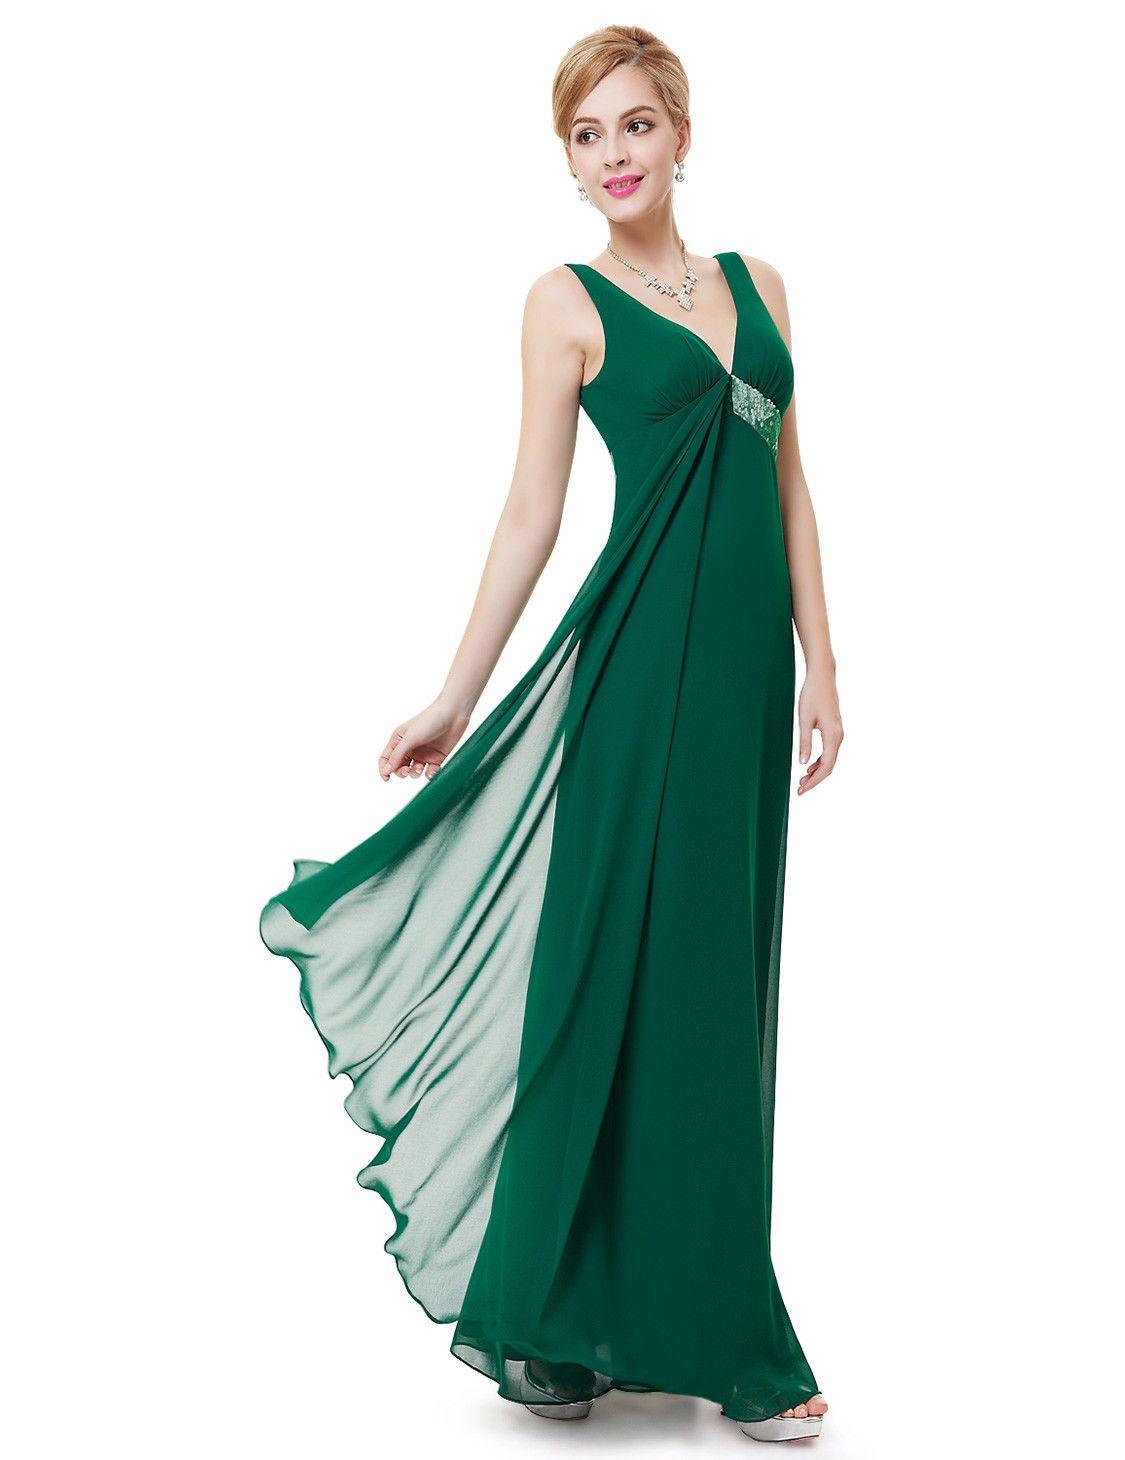 Long party dresses cool amazing women bridesmaid evening maxi